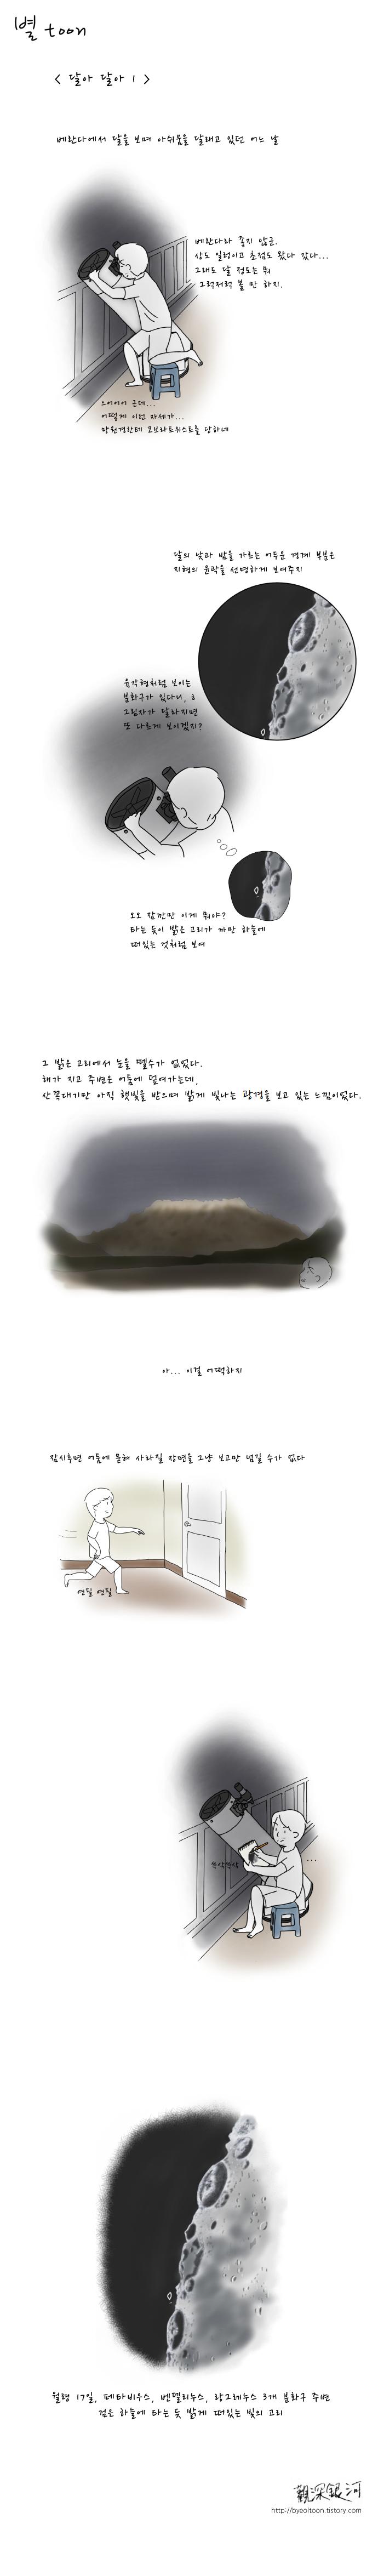 byeoltoon-019.png